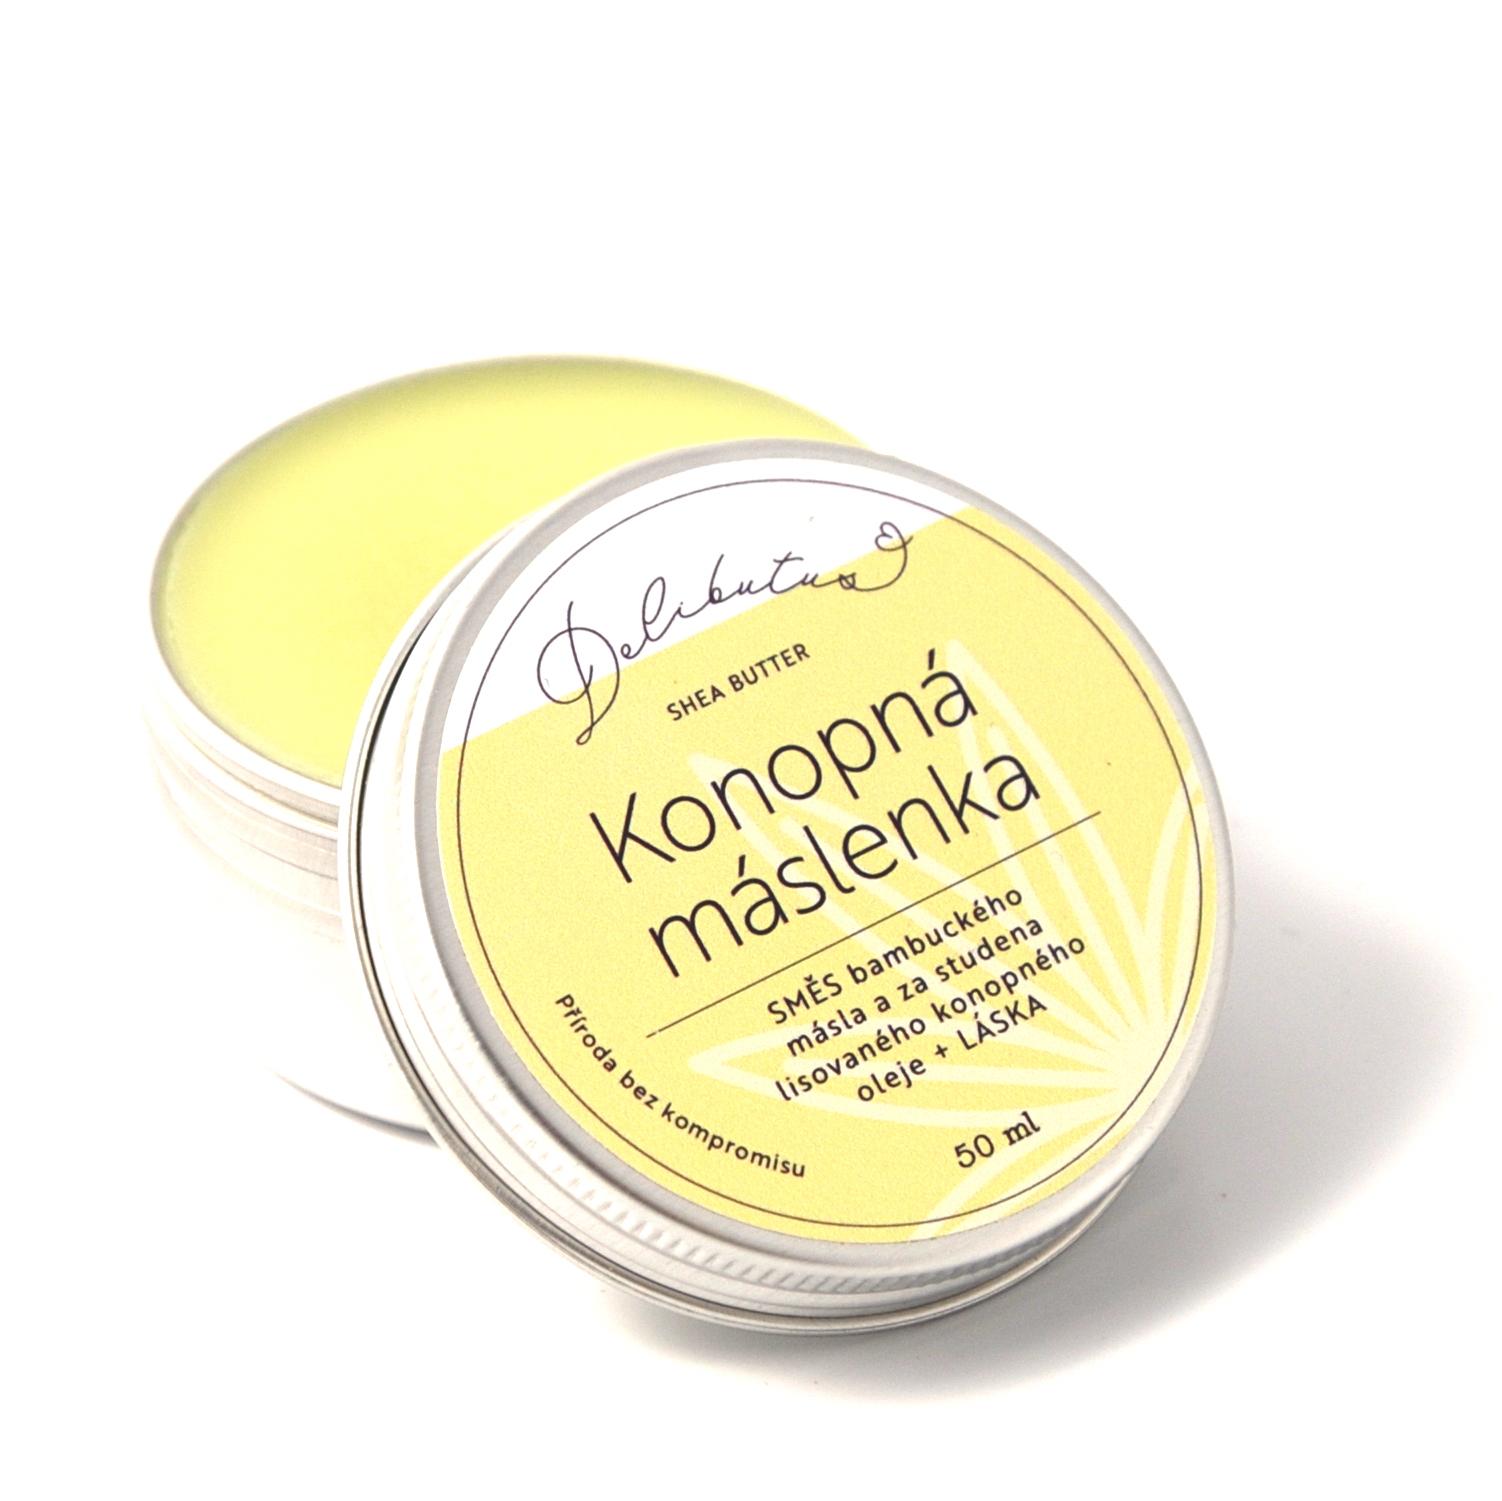 konopna_maslenka_50ml